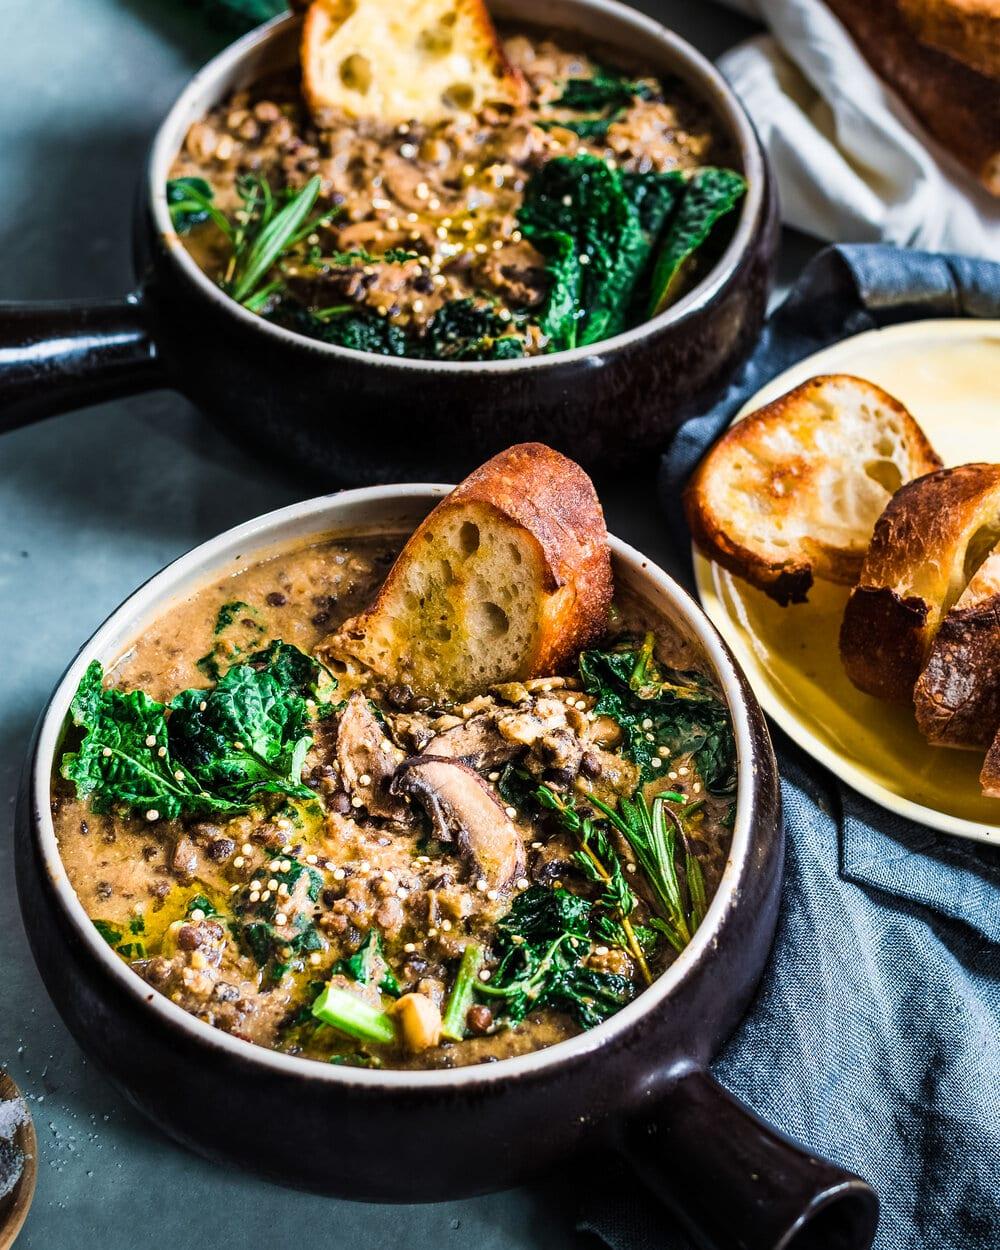 Creamy Mushroom and Black Beluga Lentil Stew